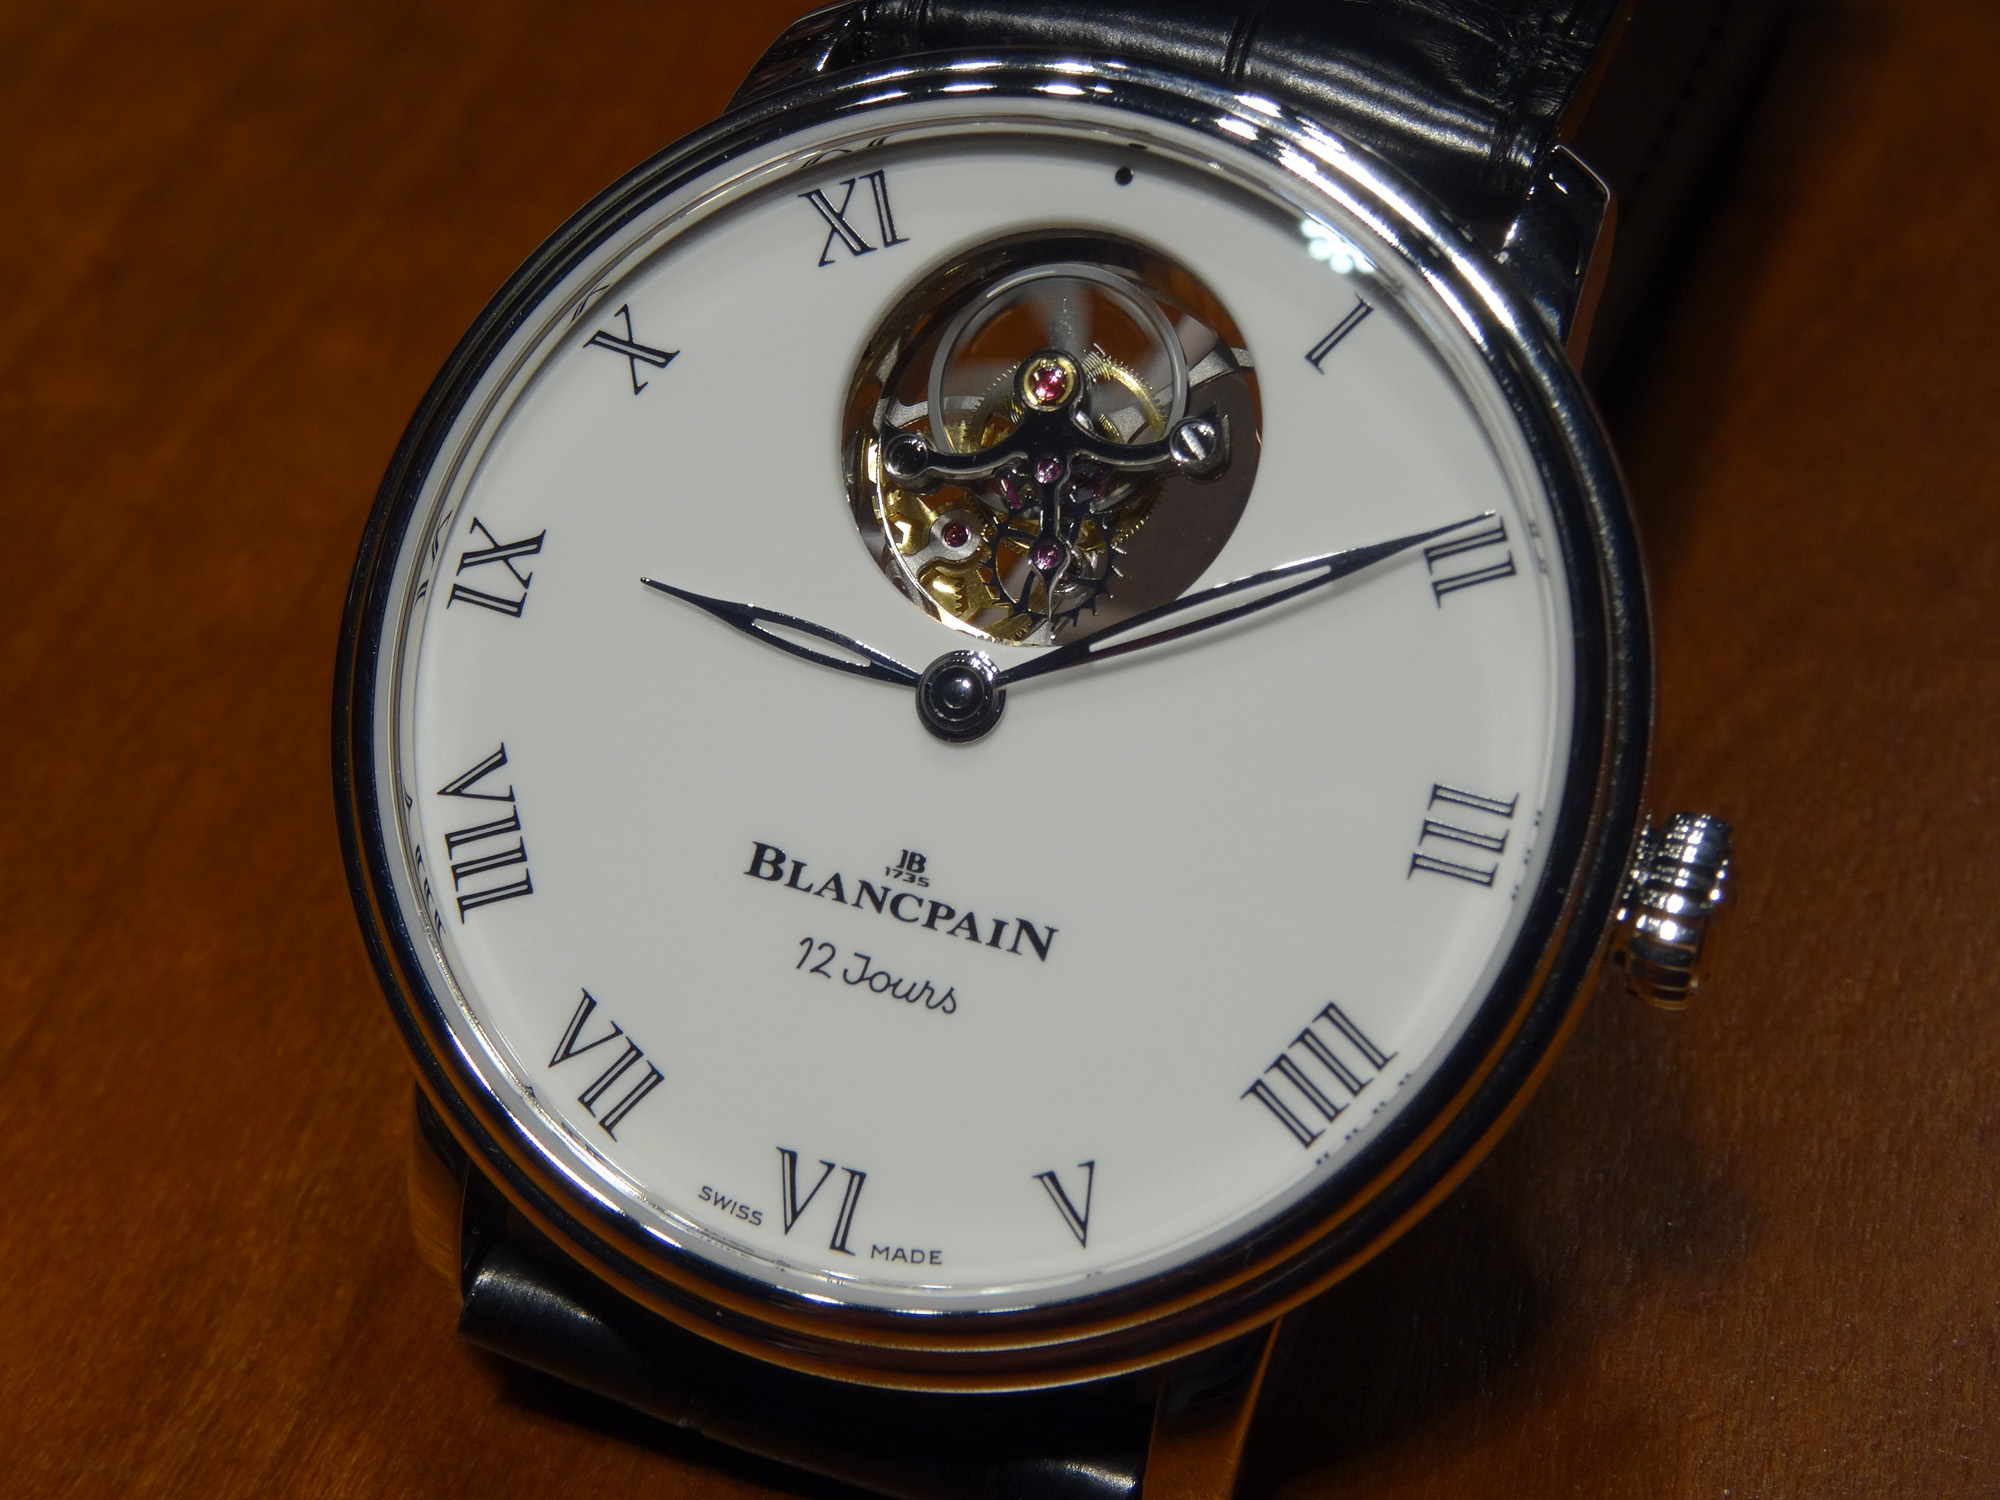 Blancpain Villeret Tourbillon 12 Jours